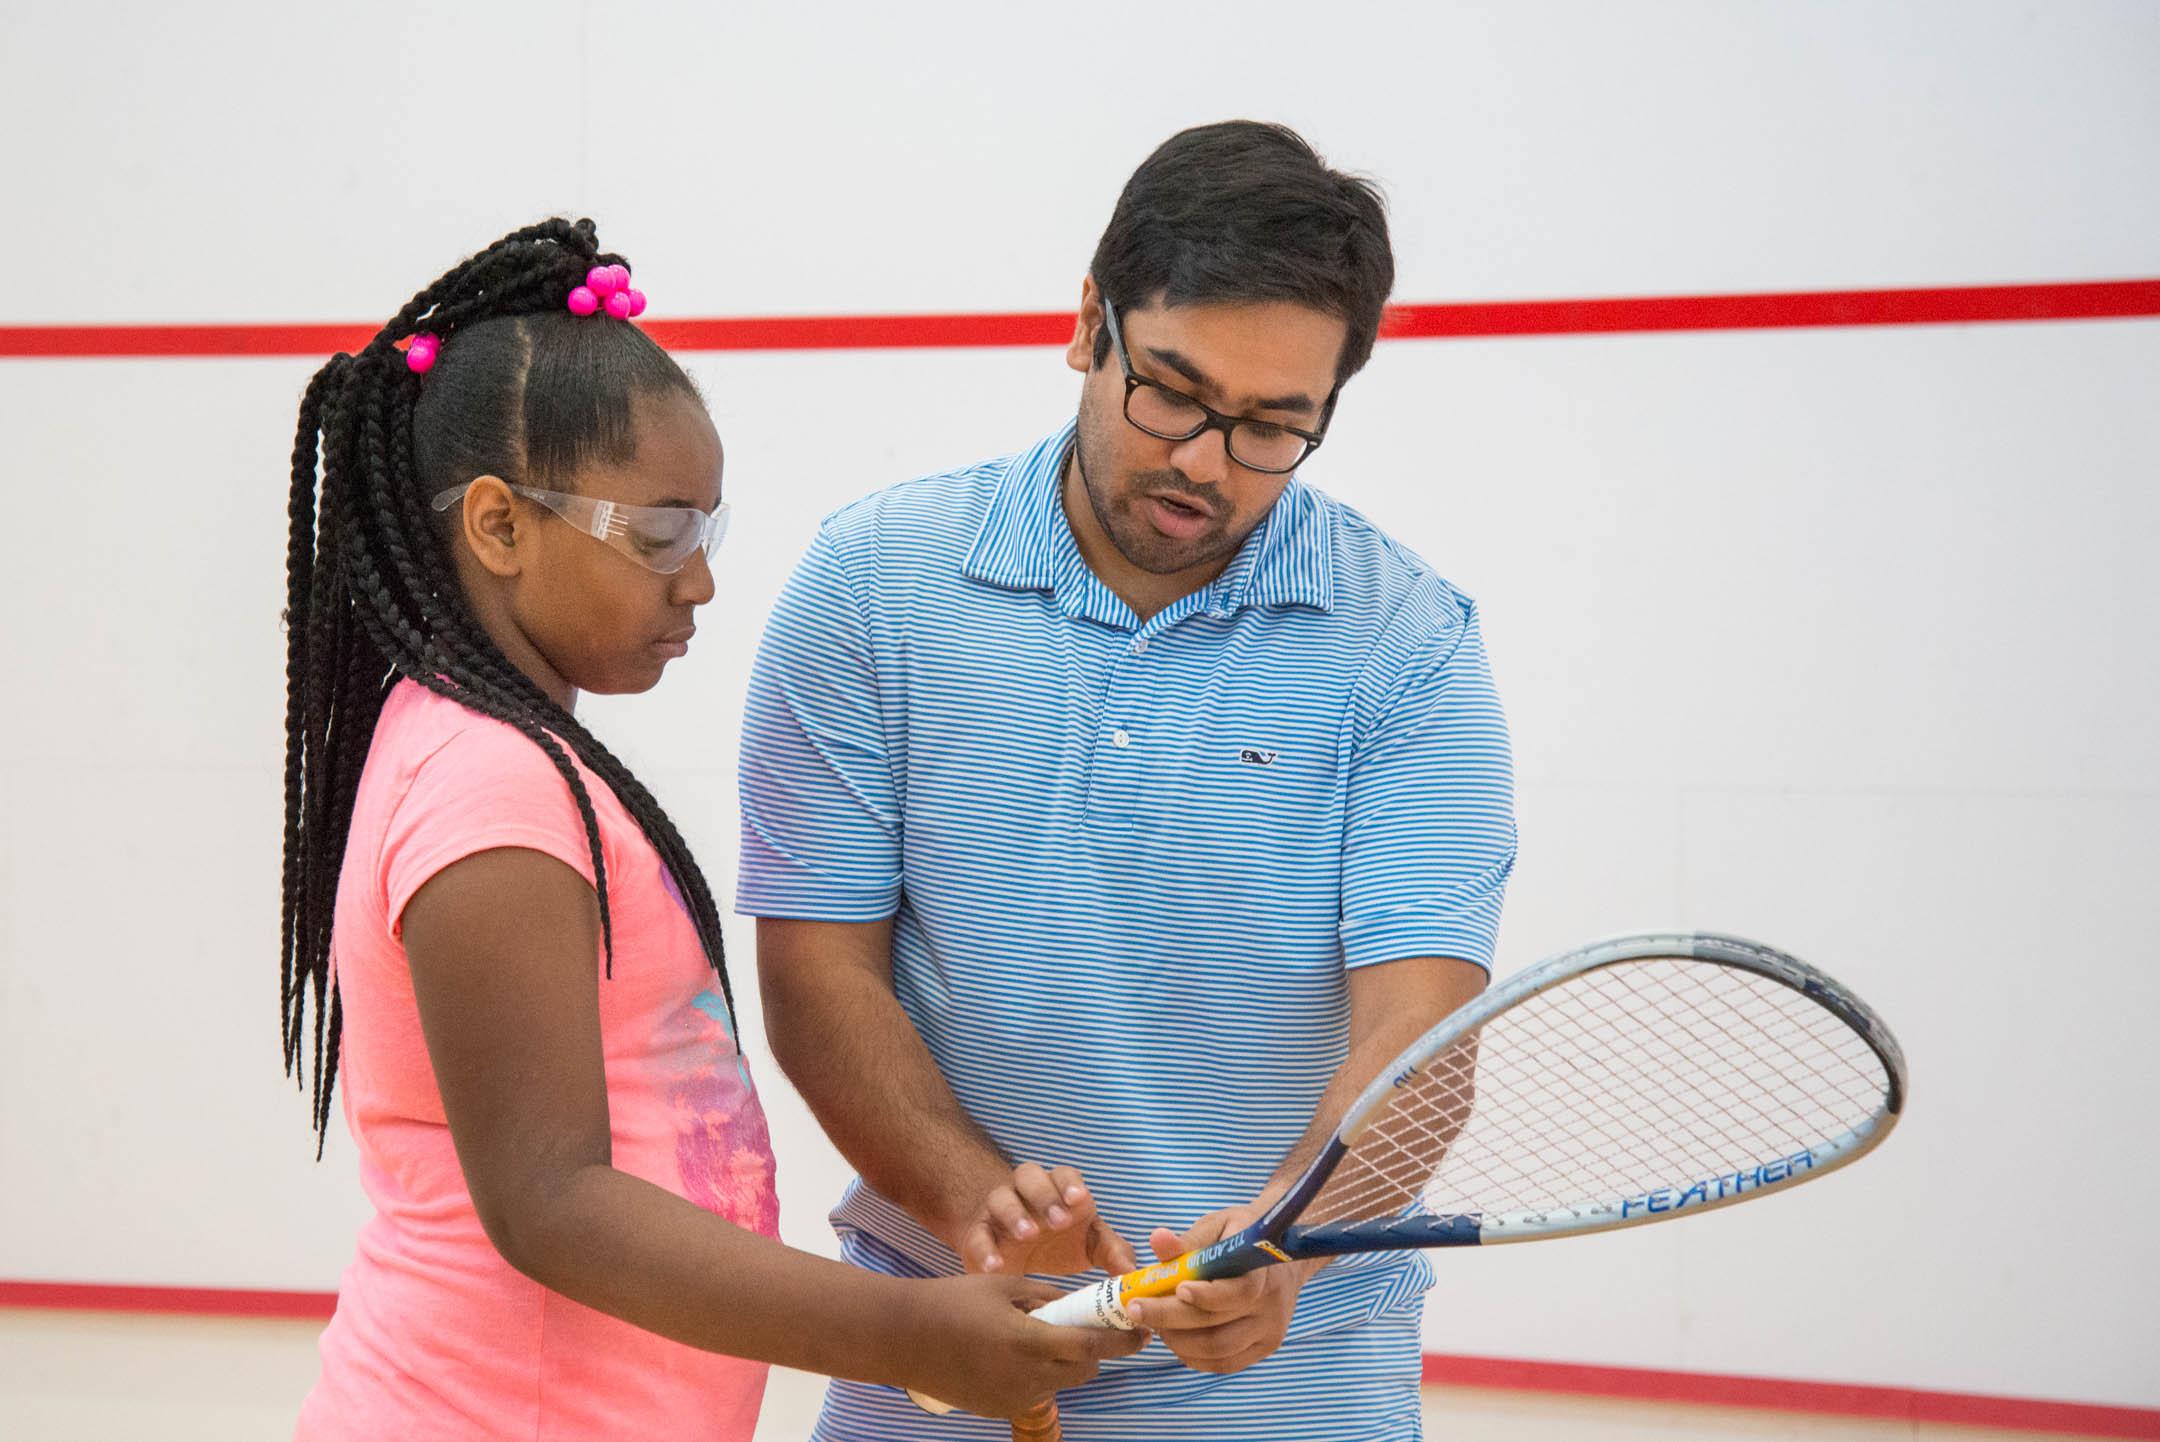 Coach Vir Seth helps Katie Whitt through proper technique during practice at the Cincinnati Squash Academy Monday May 8, 2017.